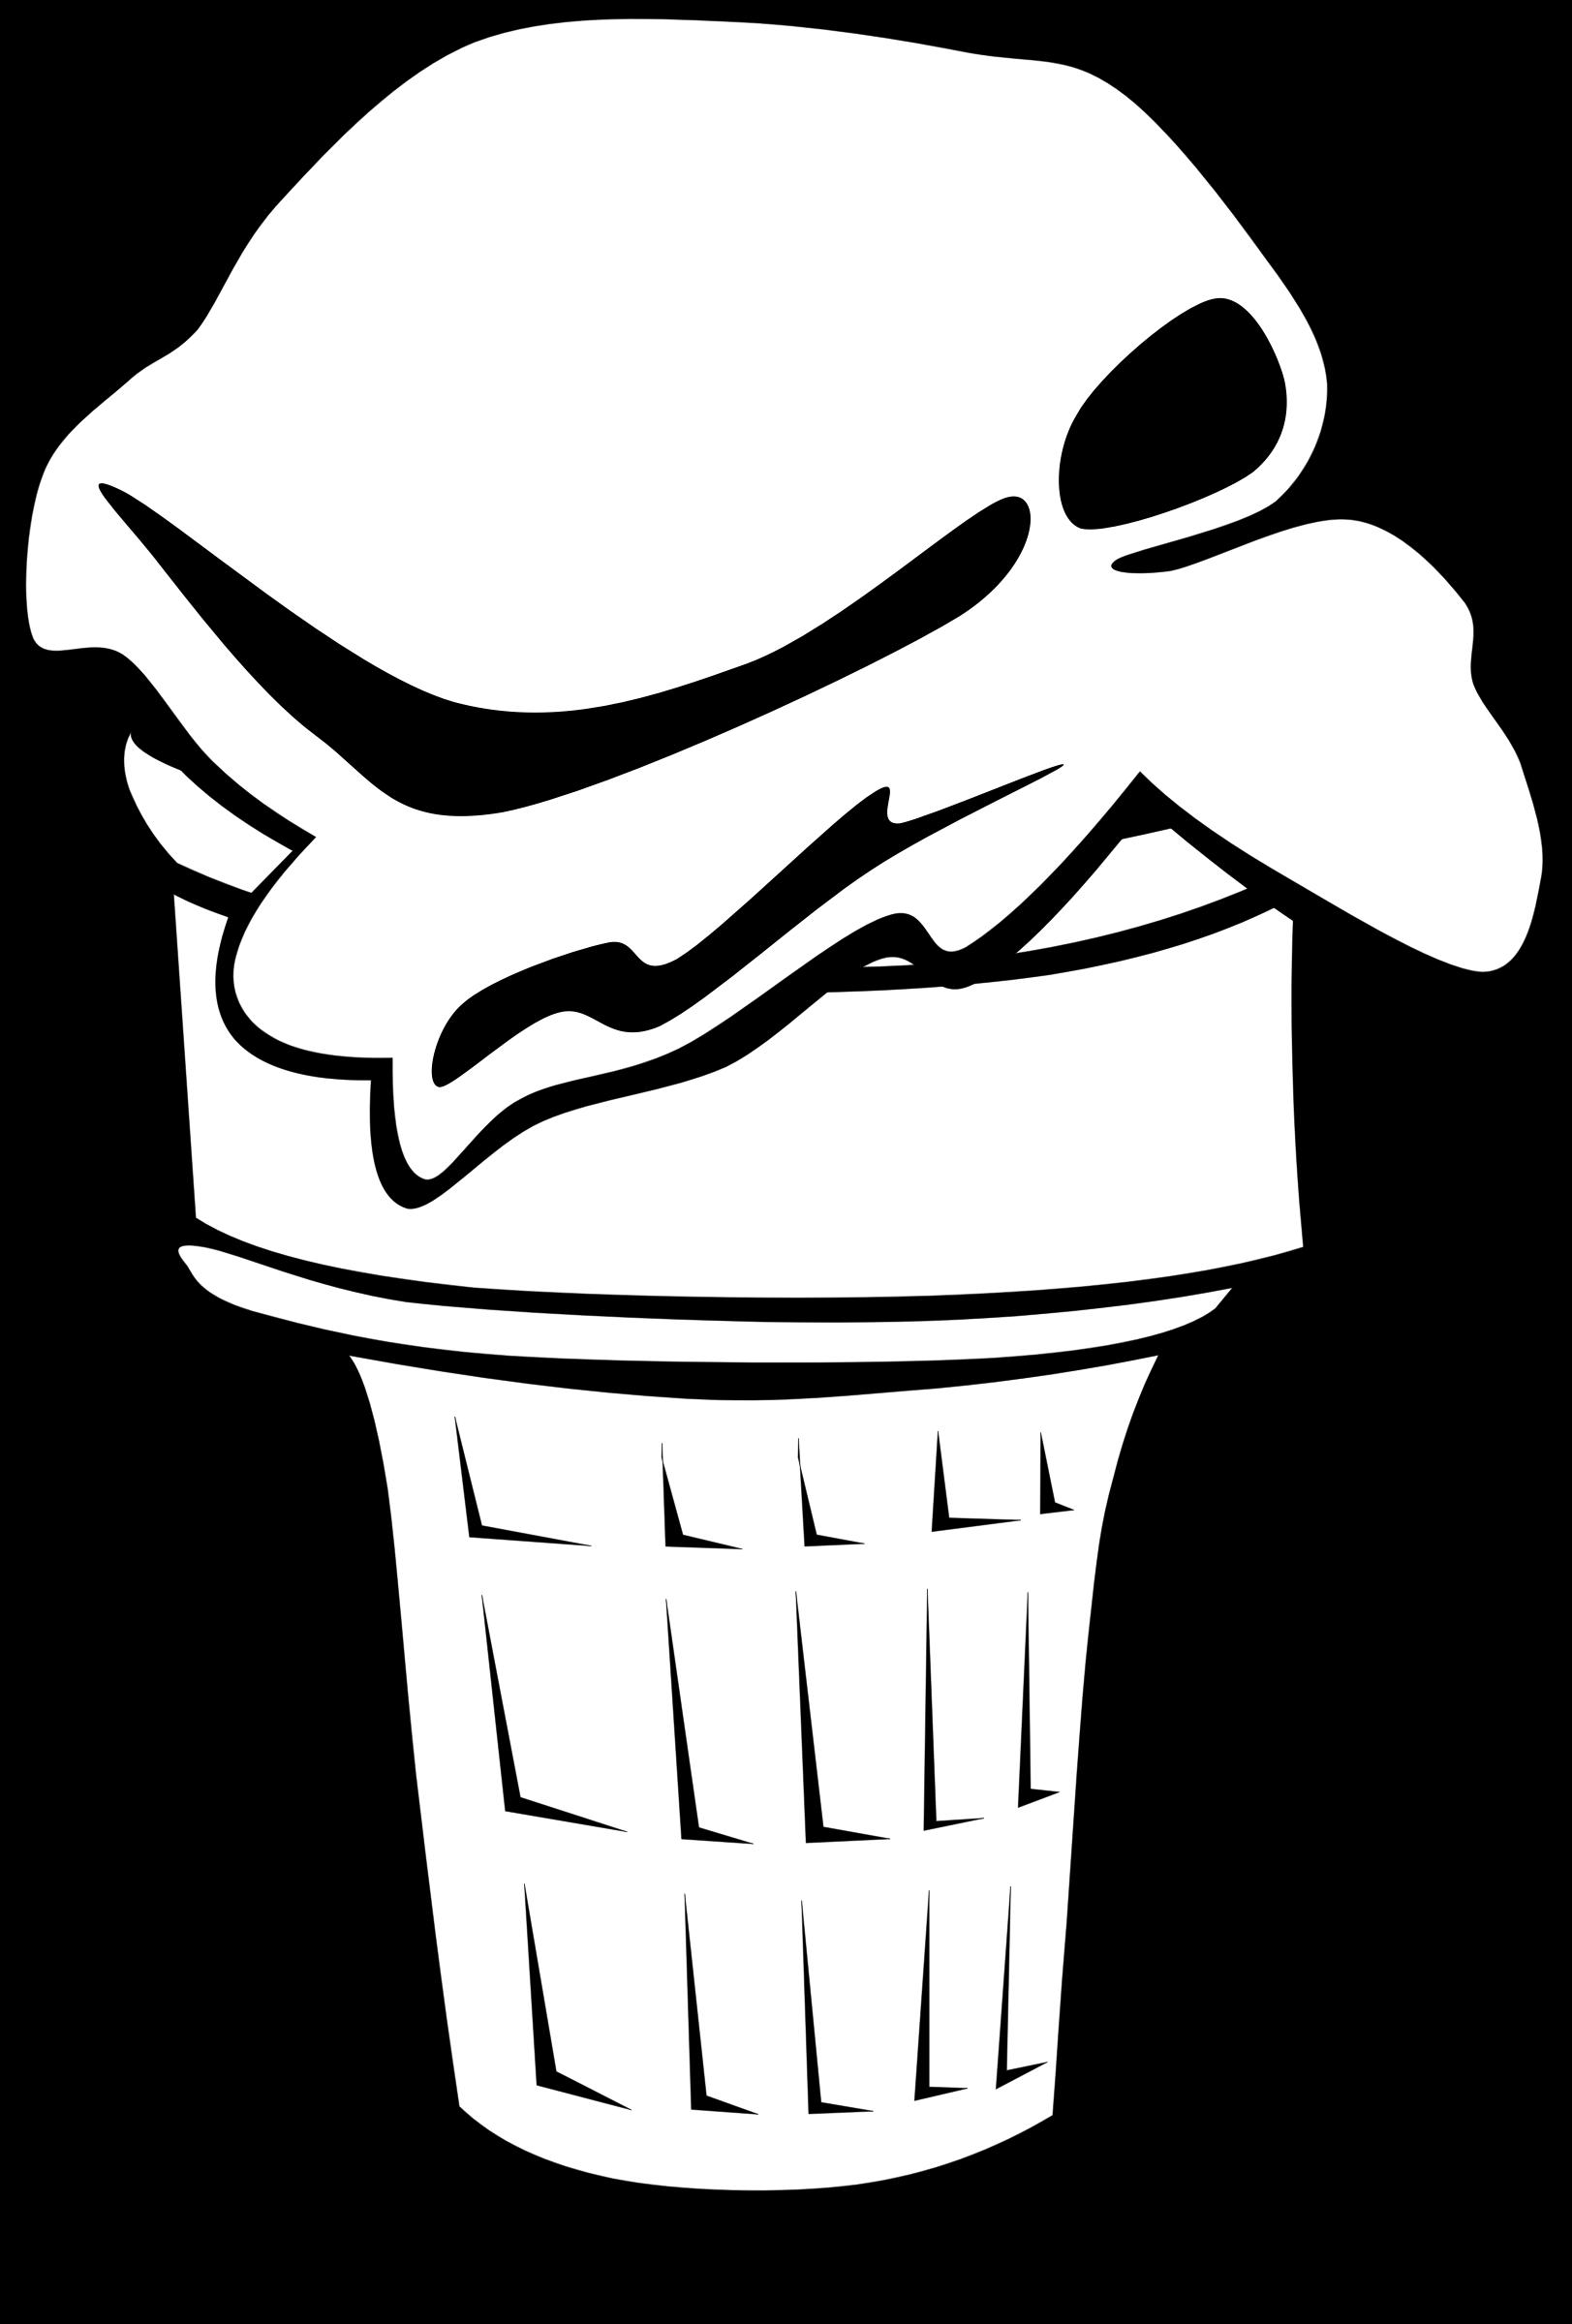 Clipart - Fast Food, Desserts, Ice Cream Cone, Single for Bowl Of Ice Cream Clipart Black And White  287fsj